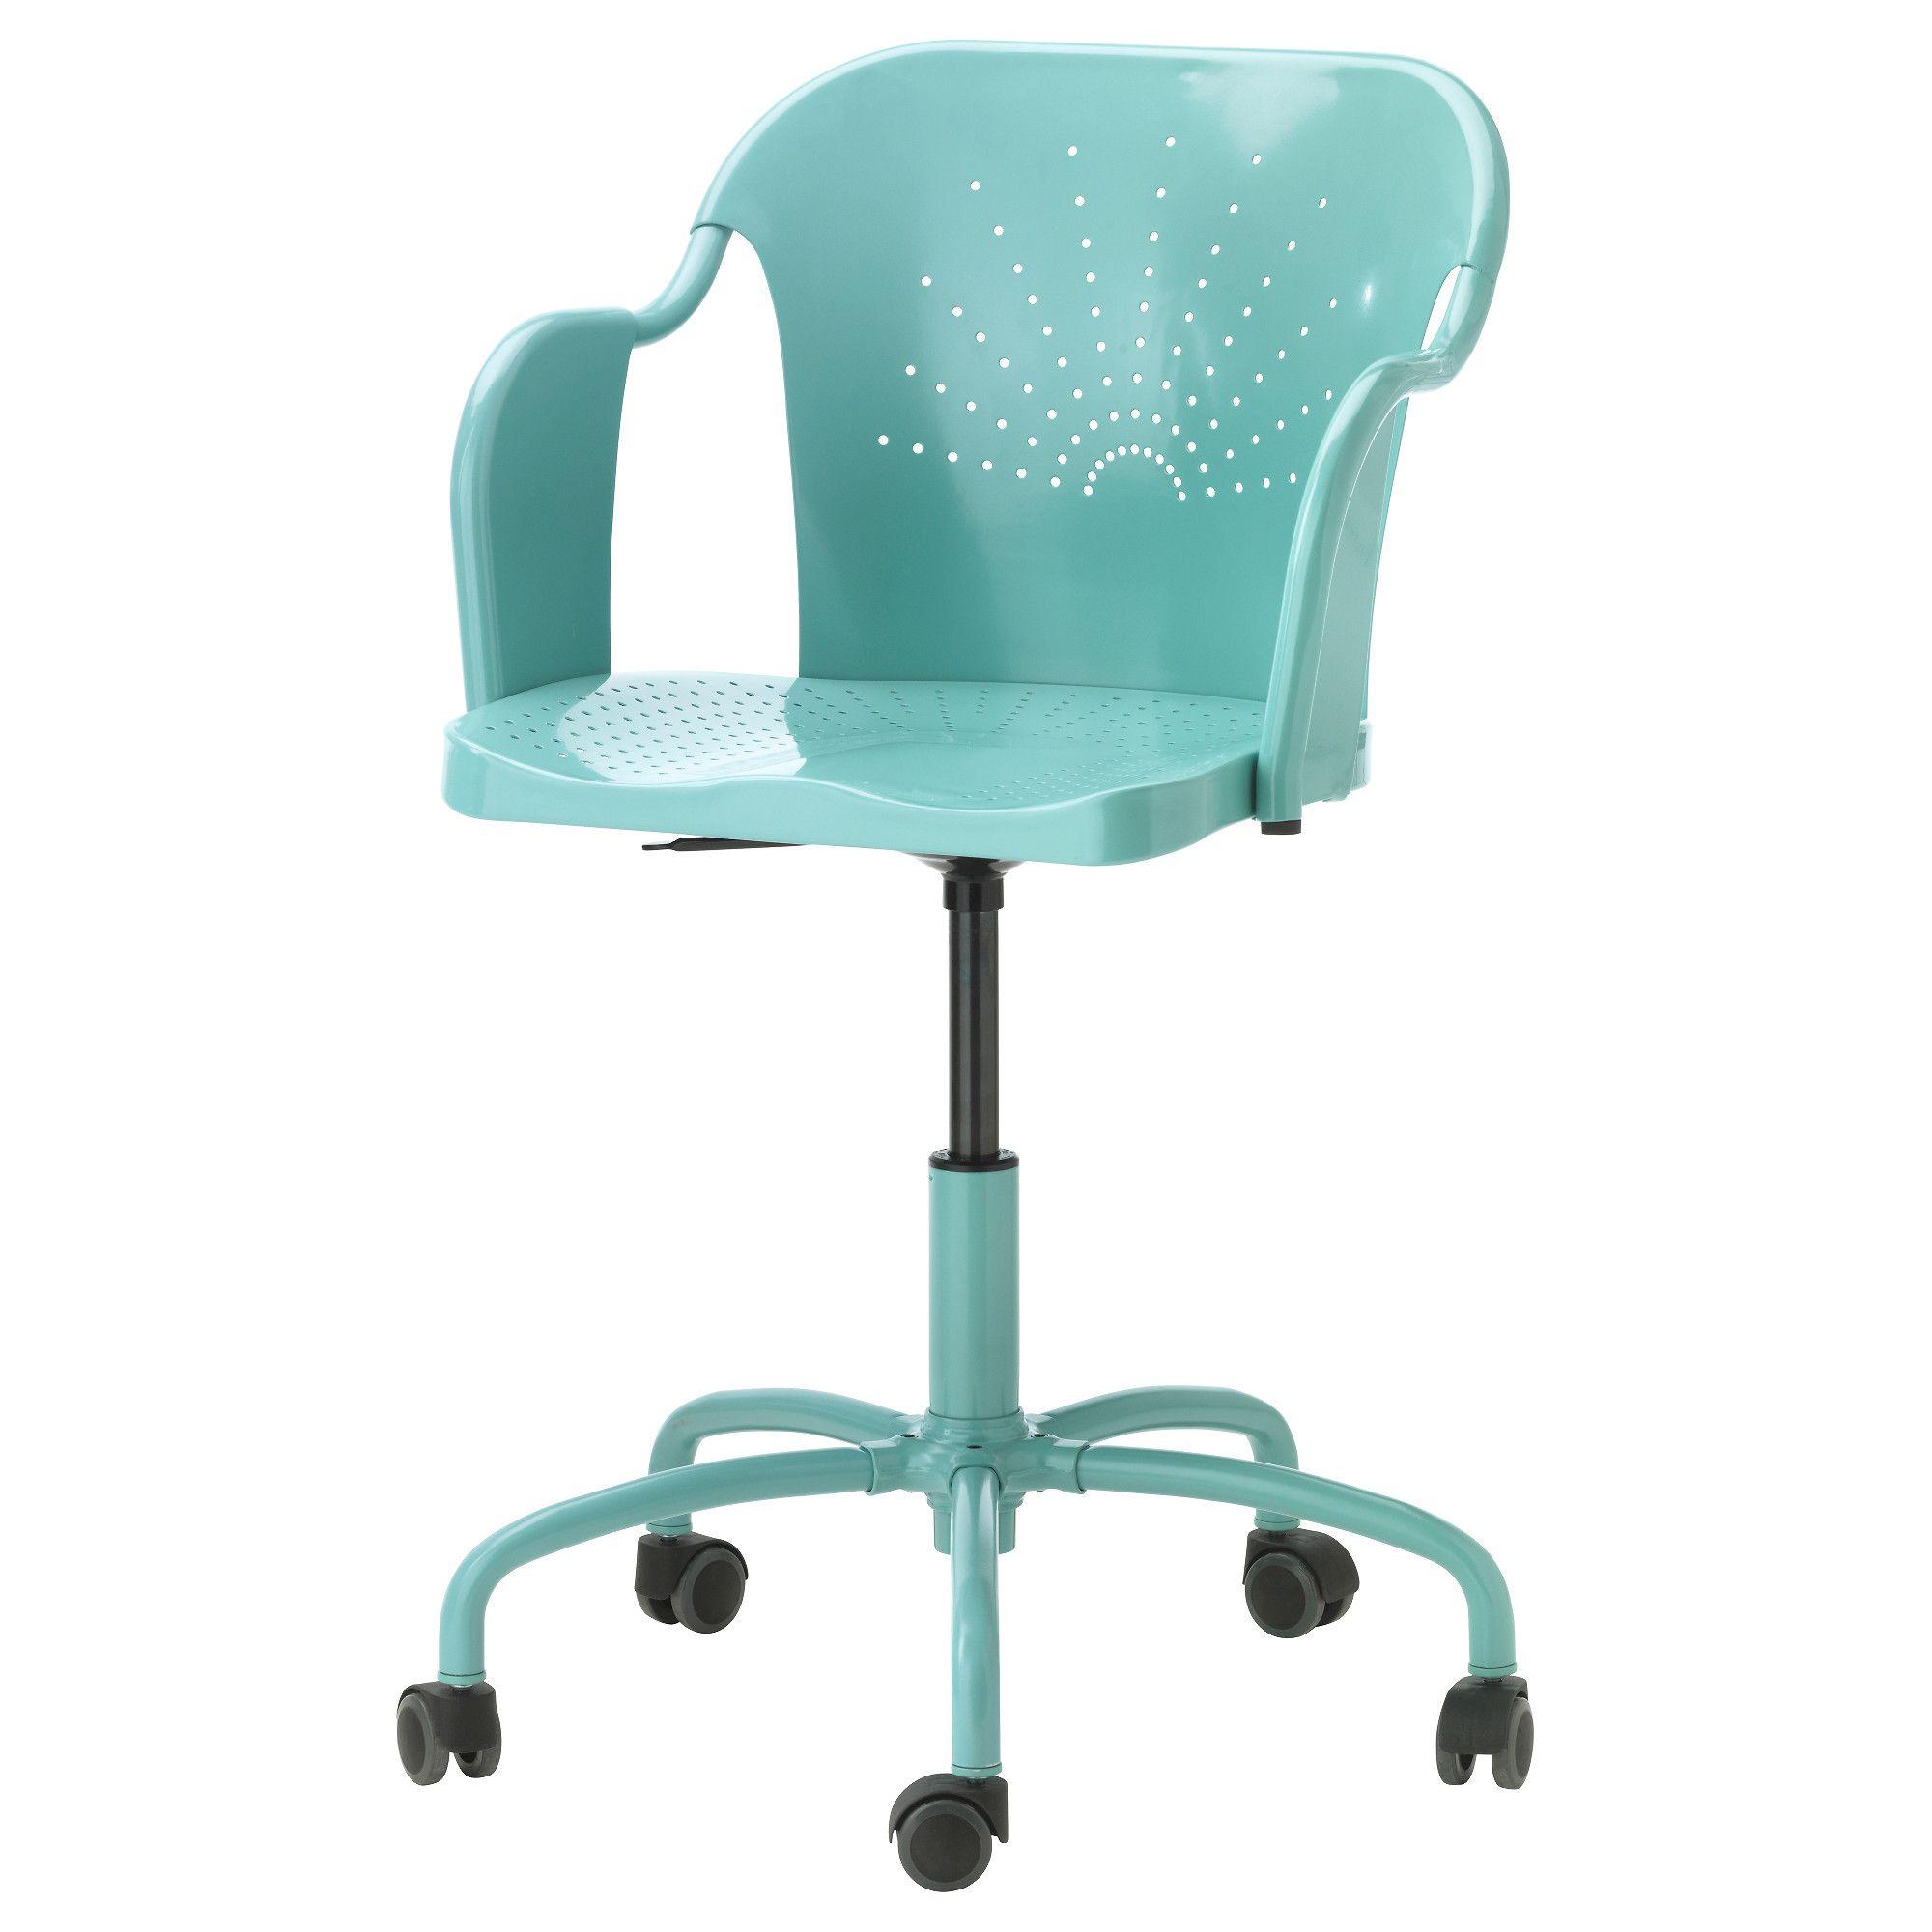 Us Furniture And Home Furnishings Ikea Chair Ikea Office Chair Ikea